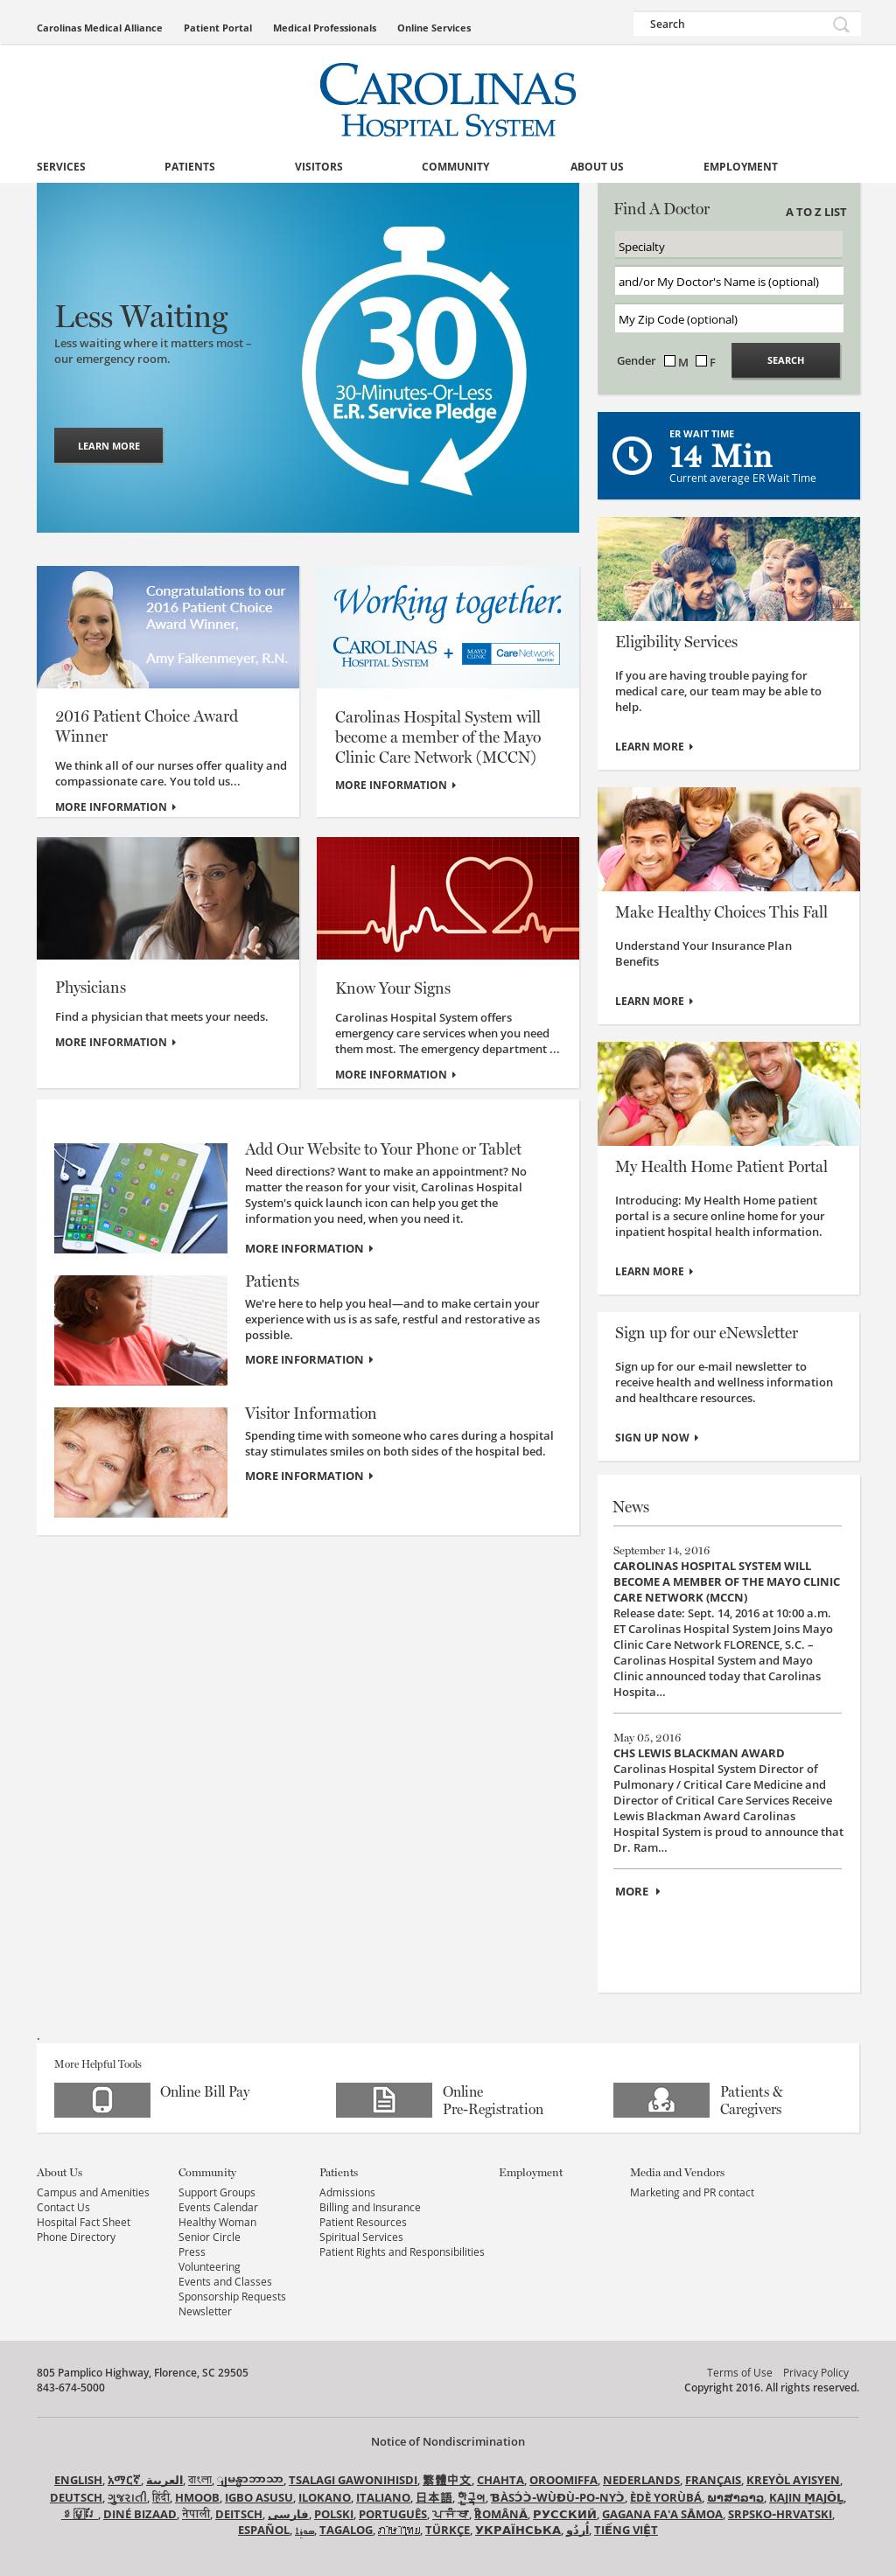 Carolinas Hospital System Competitors, Revenue and Employees